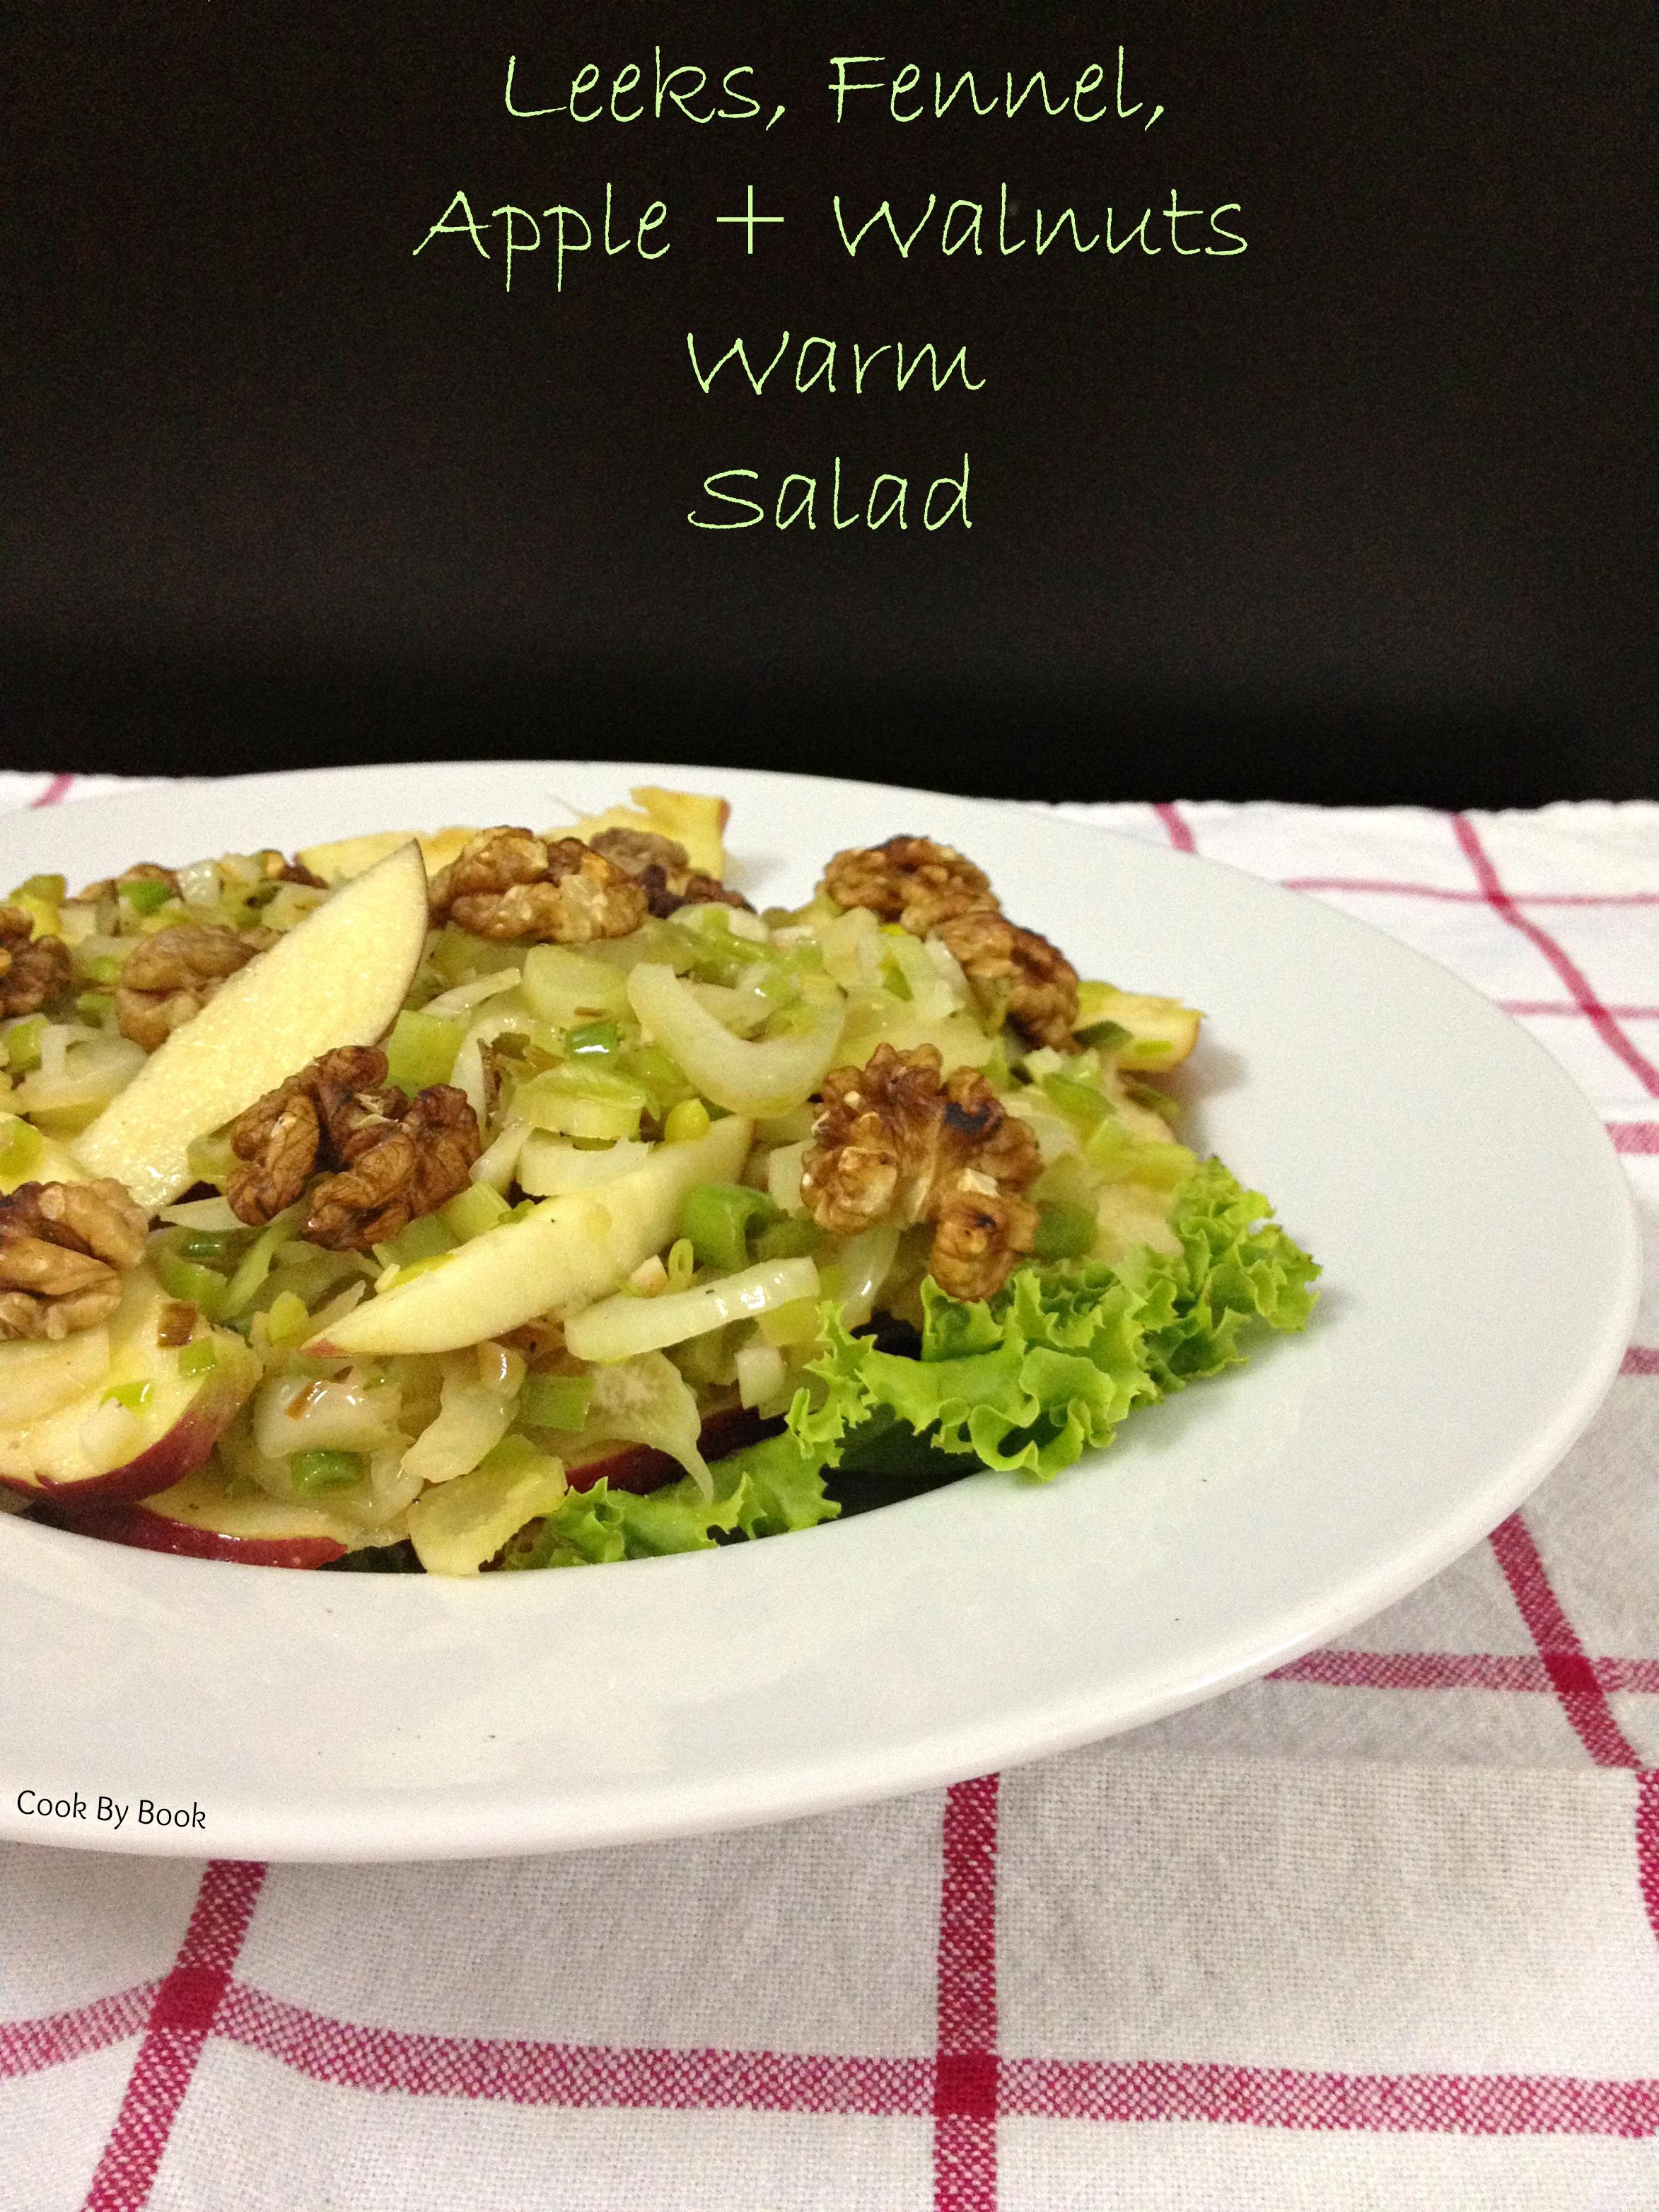 Leeks, Fennel, Apple + Walnuts Warm Salad1